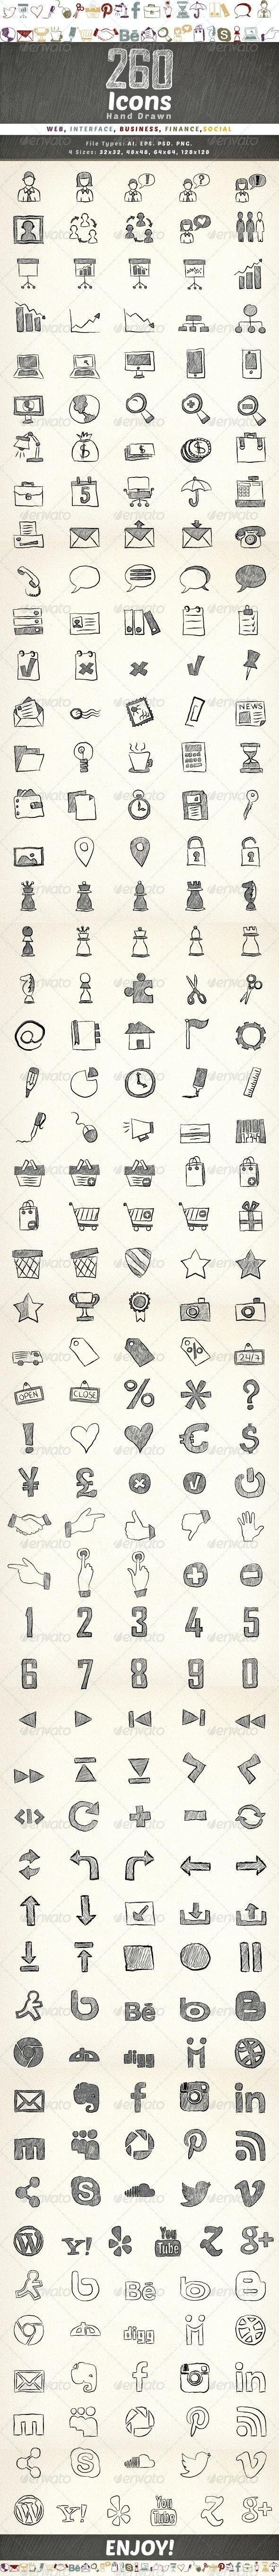 260 Hand Drawn Icons - Icons